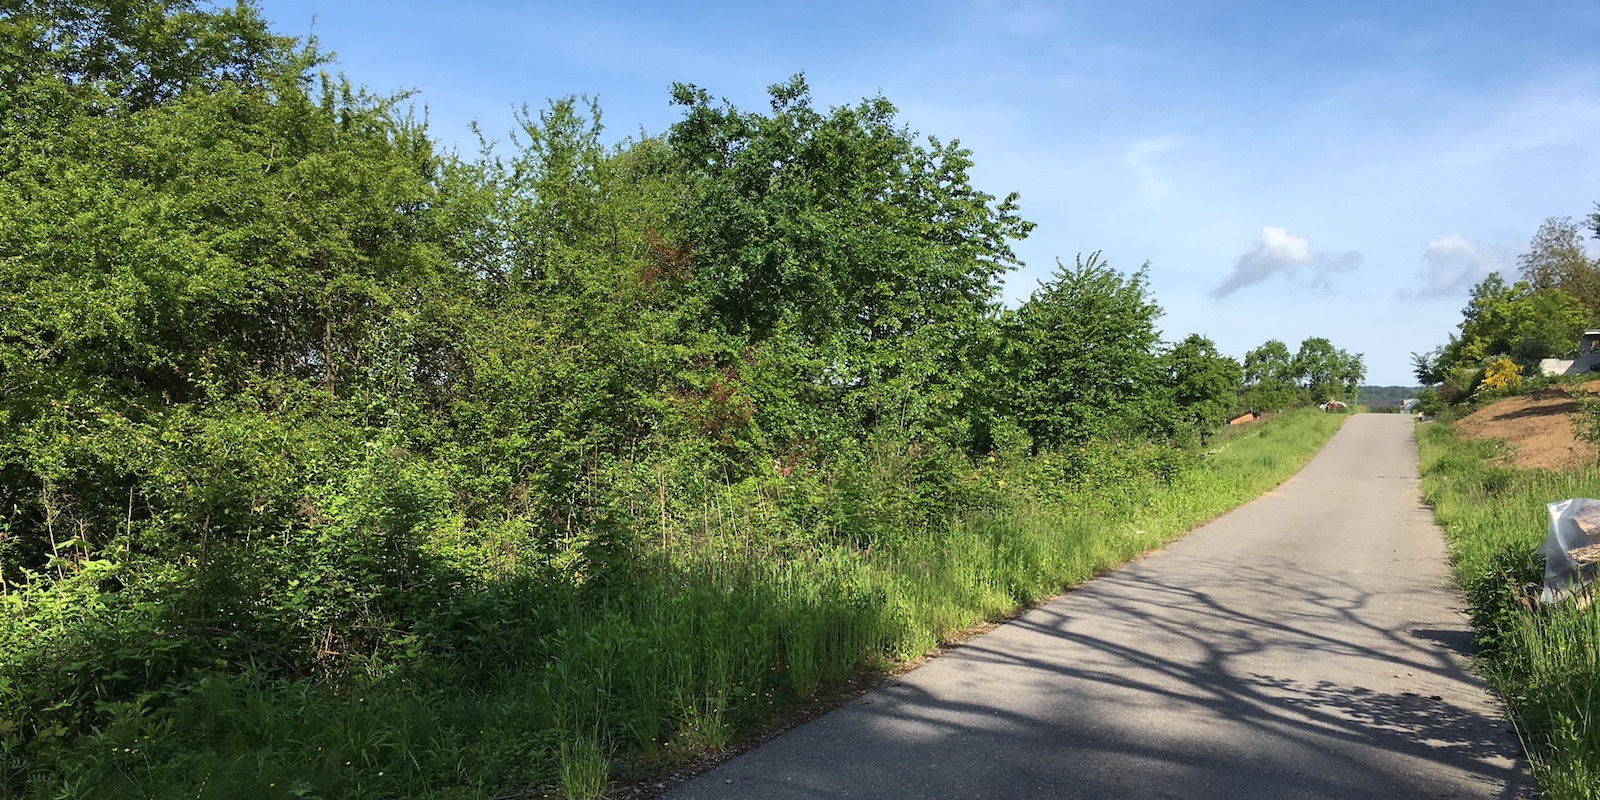 Straße entlang Richtung Waldhilsbach